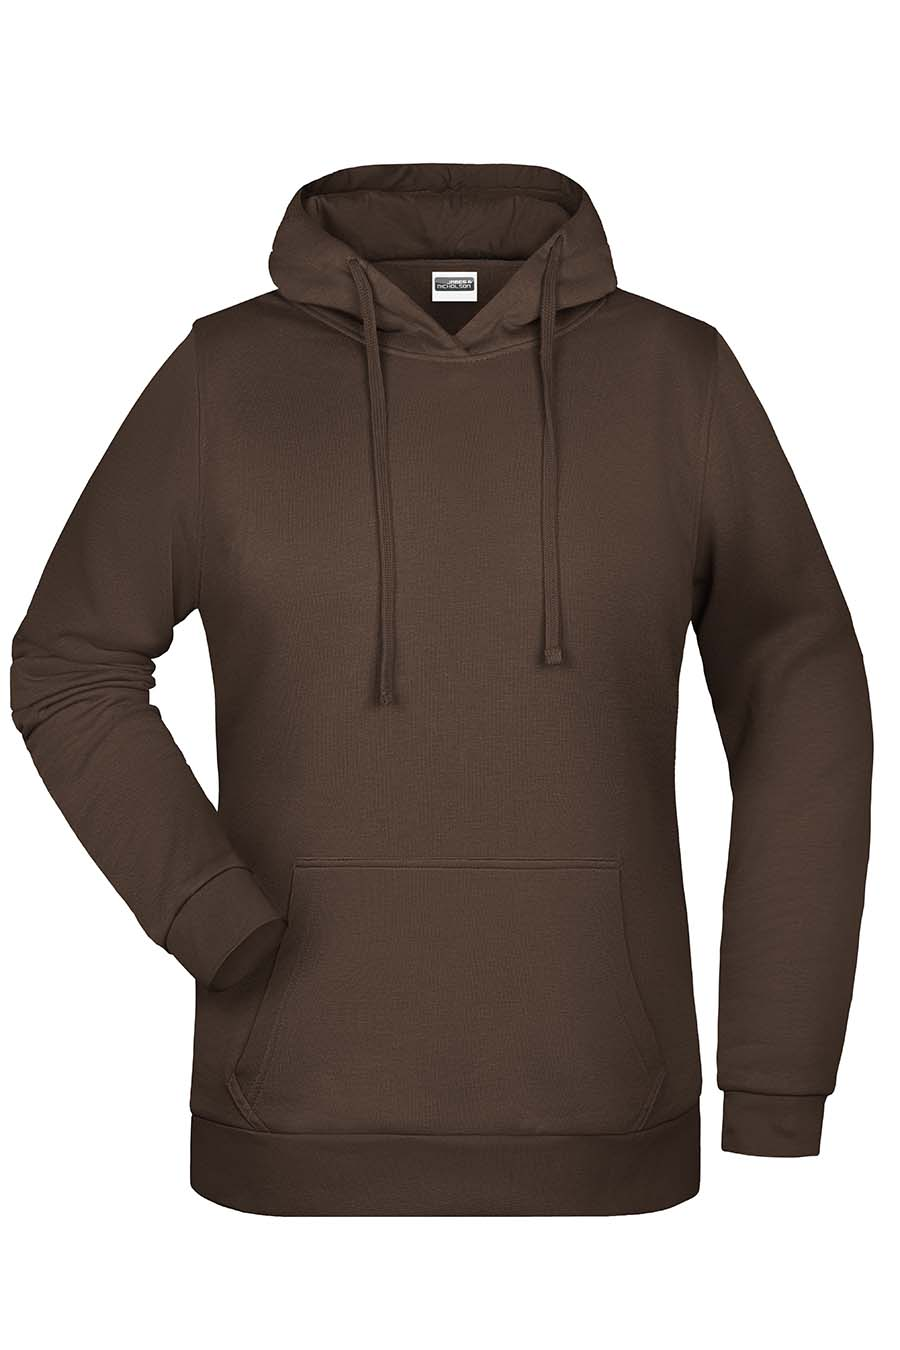 Sweat-shirt capuche femme - 20-1494-3